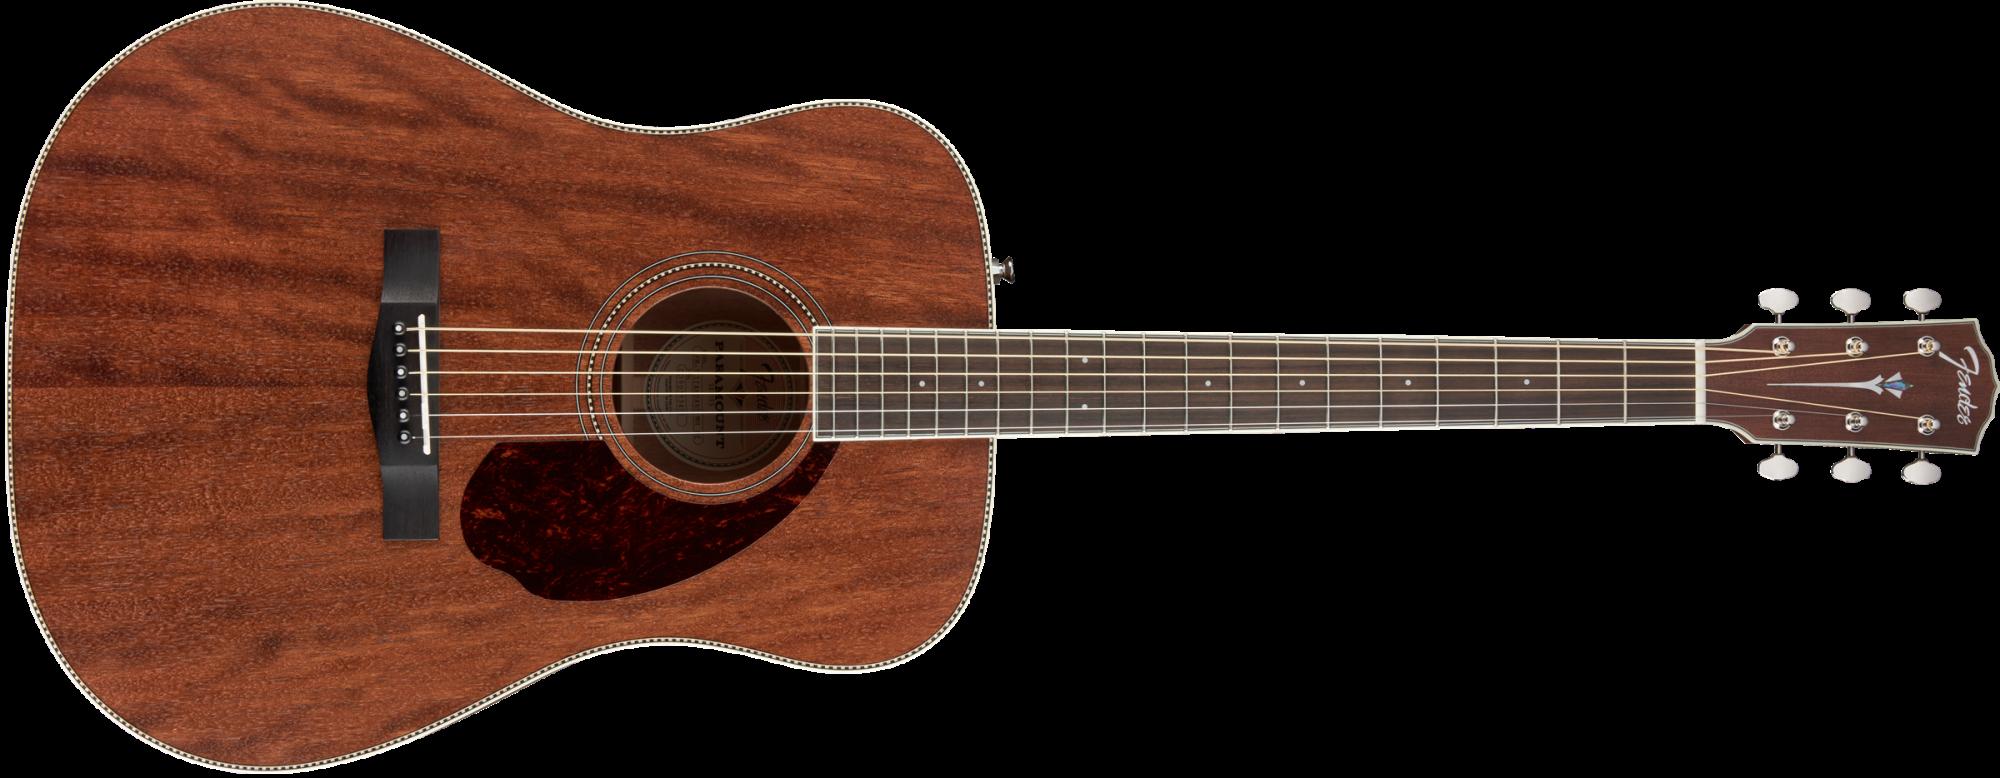 Fender Paramount PM-1 All Mahogany Dreadnought NE with Case